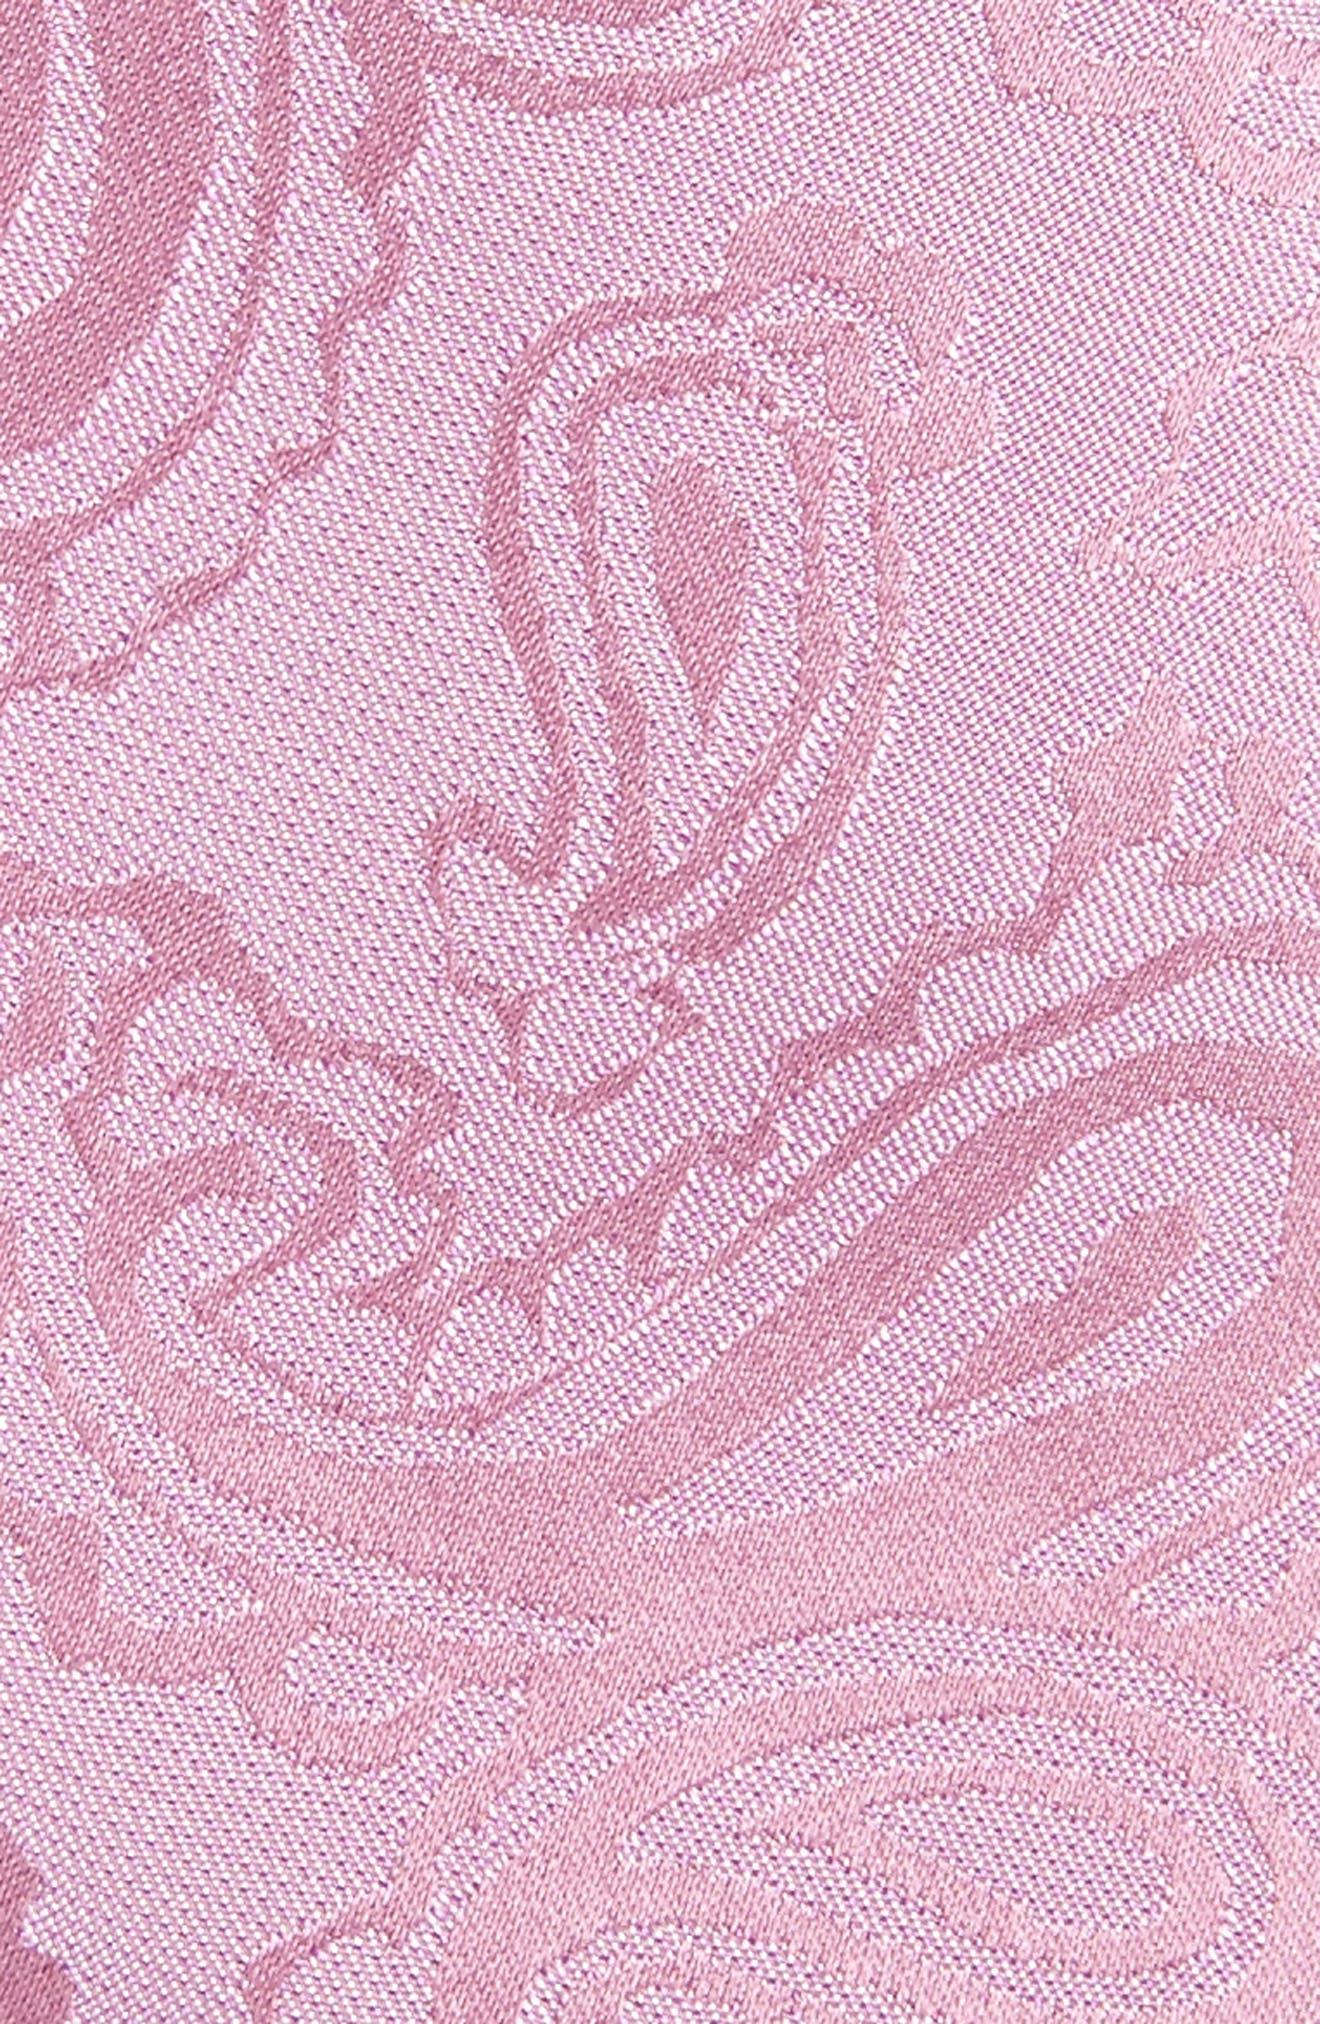 Paisley Silk Skinny Tie,                             Alternate thumbnail 10, color,